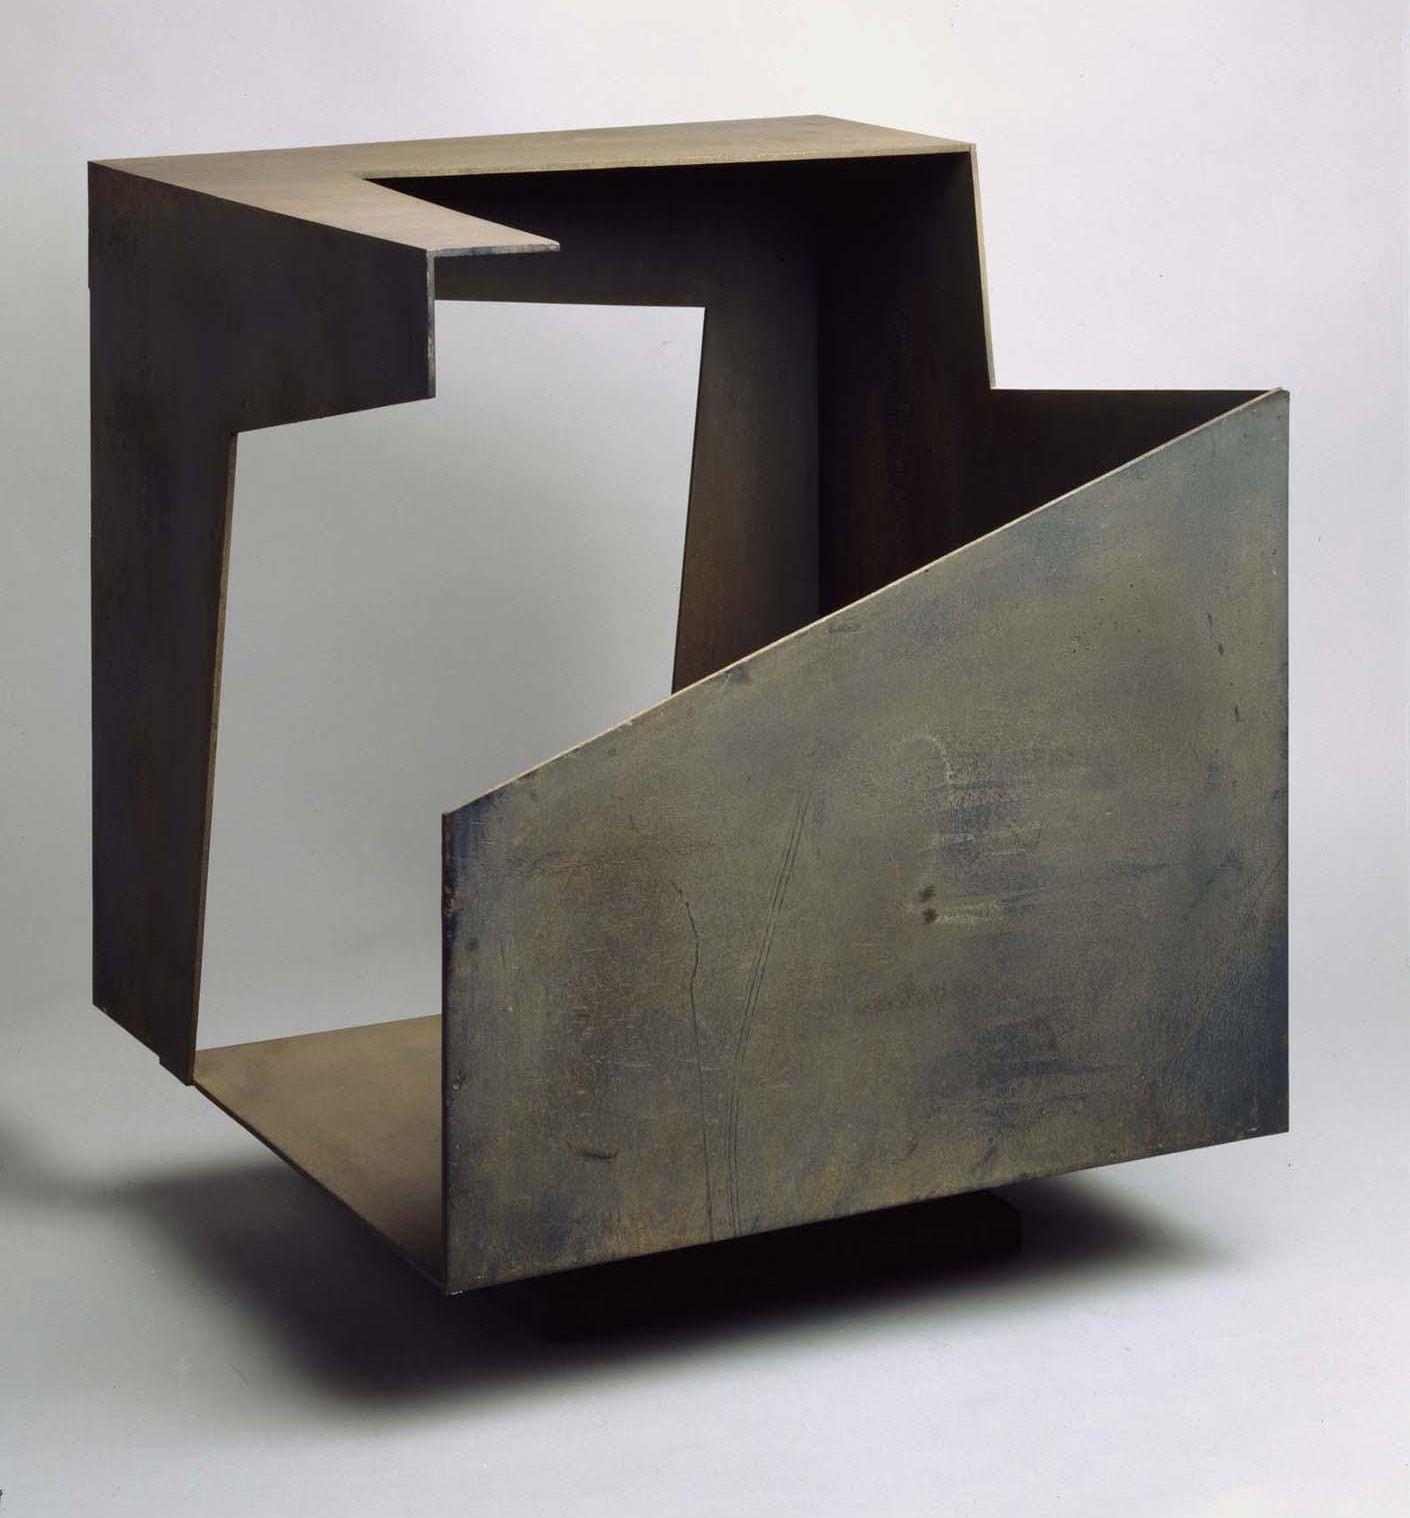 Caja metafísica - Jorge Oteiza